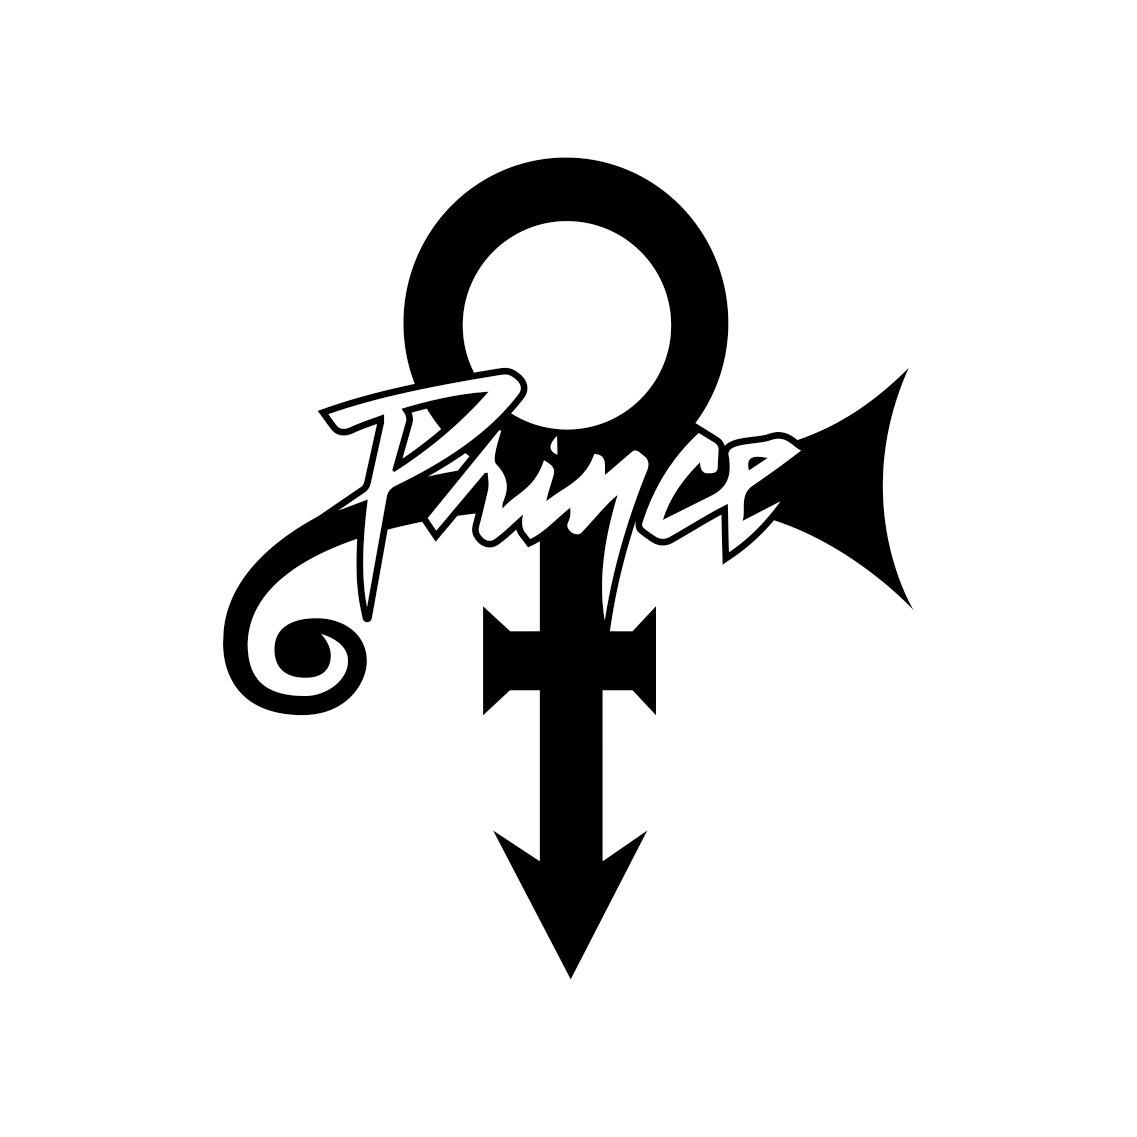 Prince Memorial Name Graphics Design Svg Dxf